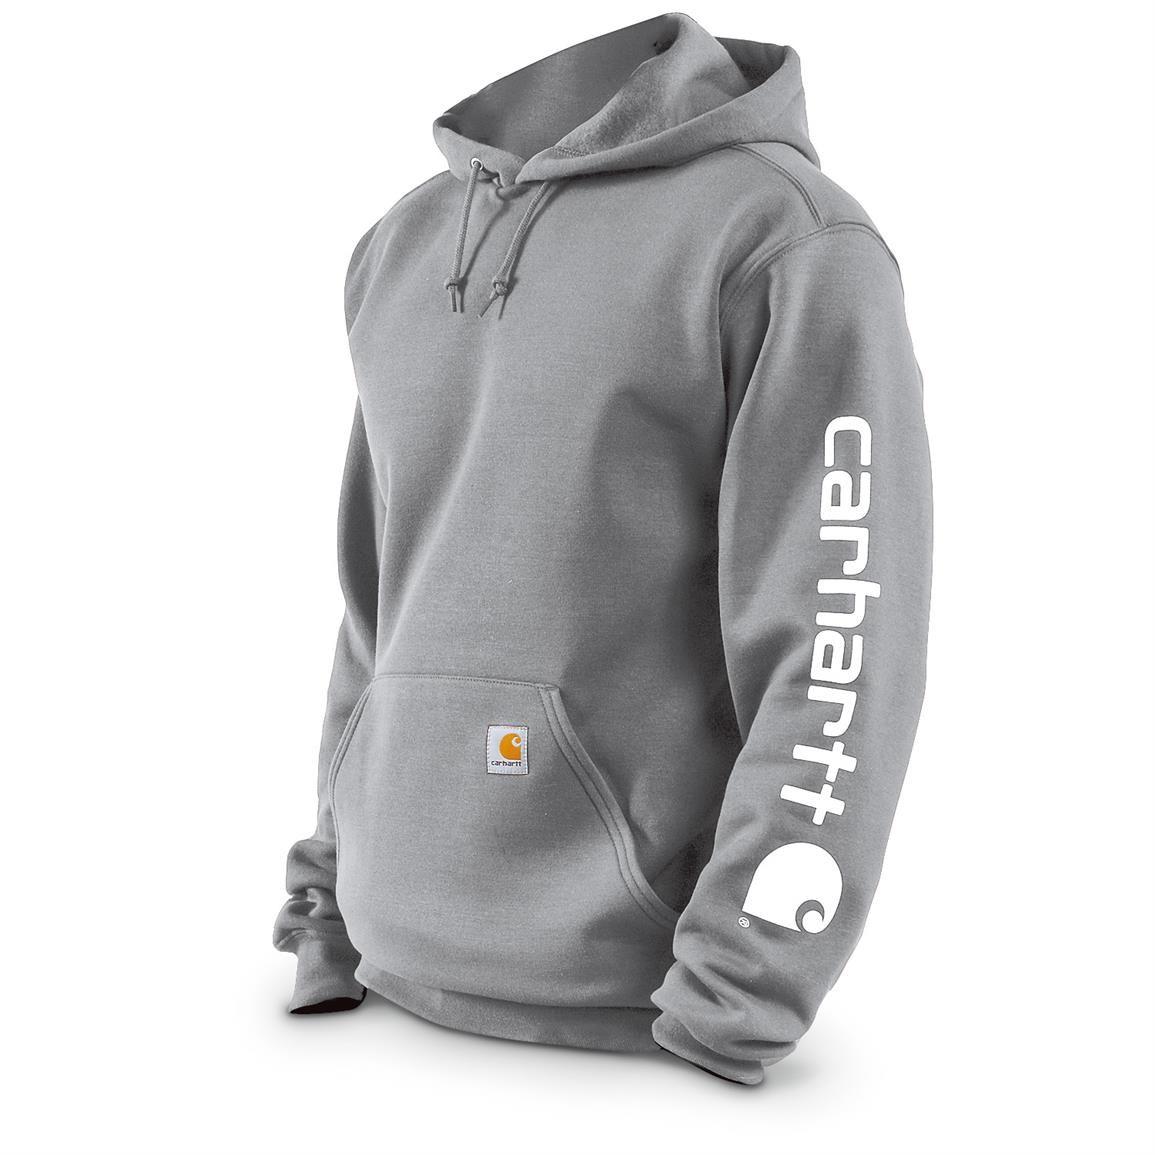 Carhartt Men S Midweight Hooded Sleeve Logo Sweatshirt Slight Irregulars Heather Gray Carhartt Sweatshirts Carhartt Mens Sweatshirts [ 1155 x 1155 Pixel ]